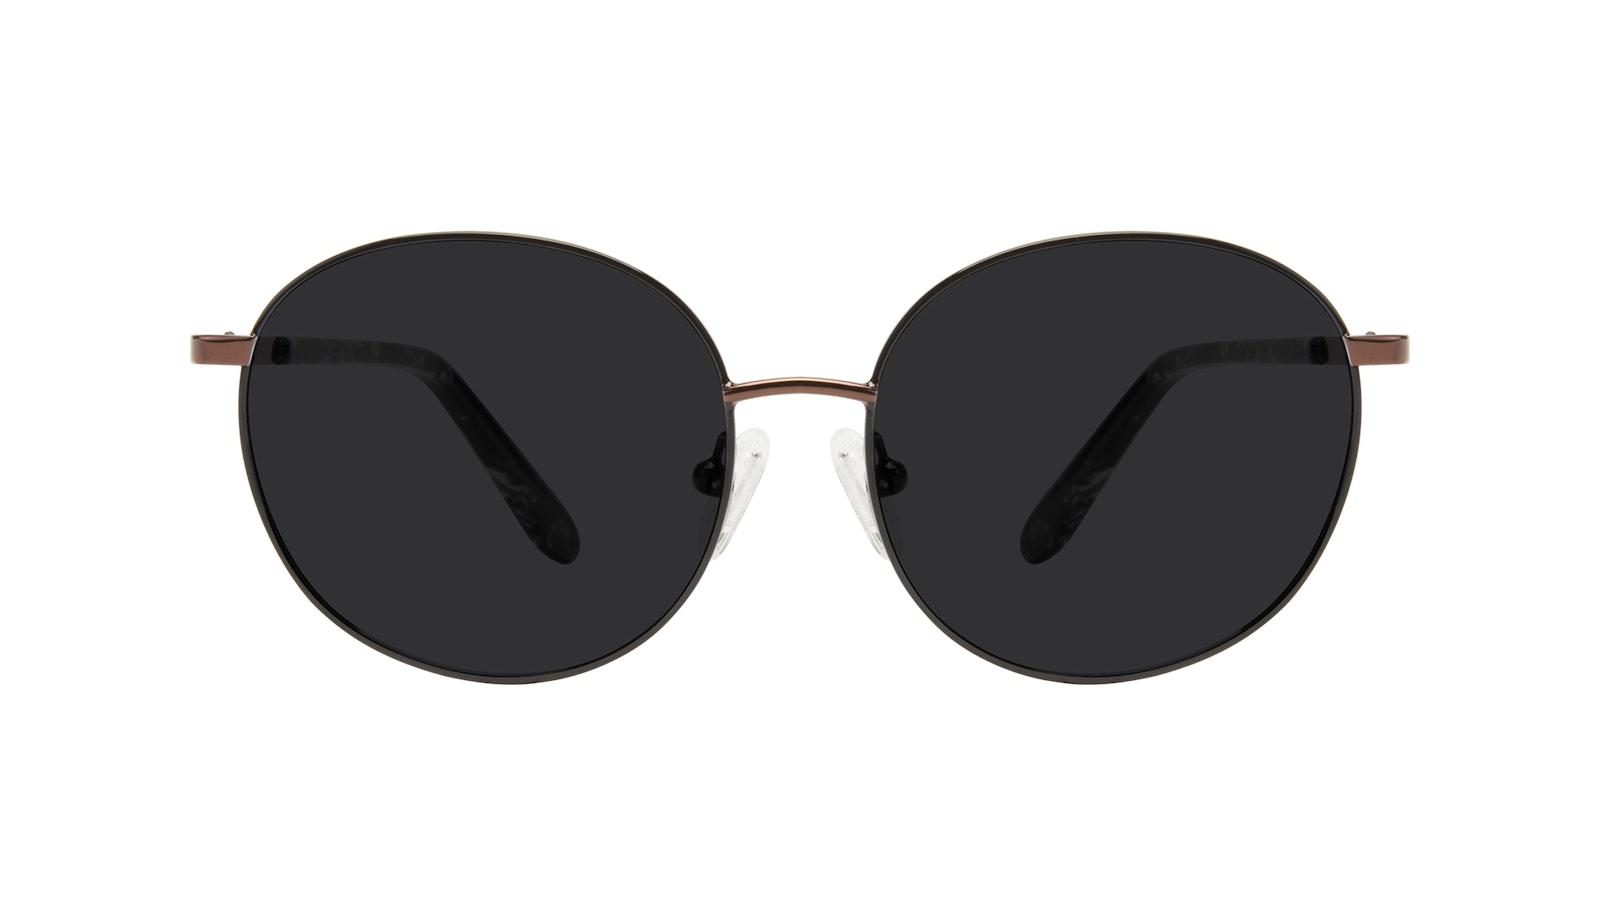 Affordable Fashion Glasses Round Sunglasses Women Joy Petite Black Copper